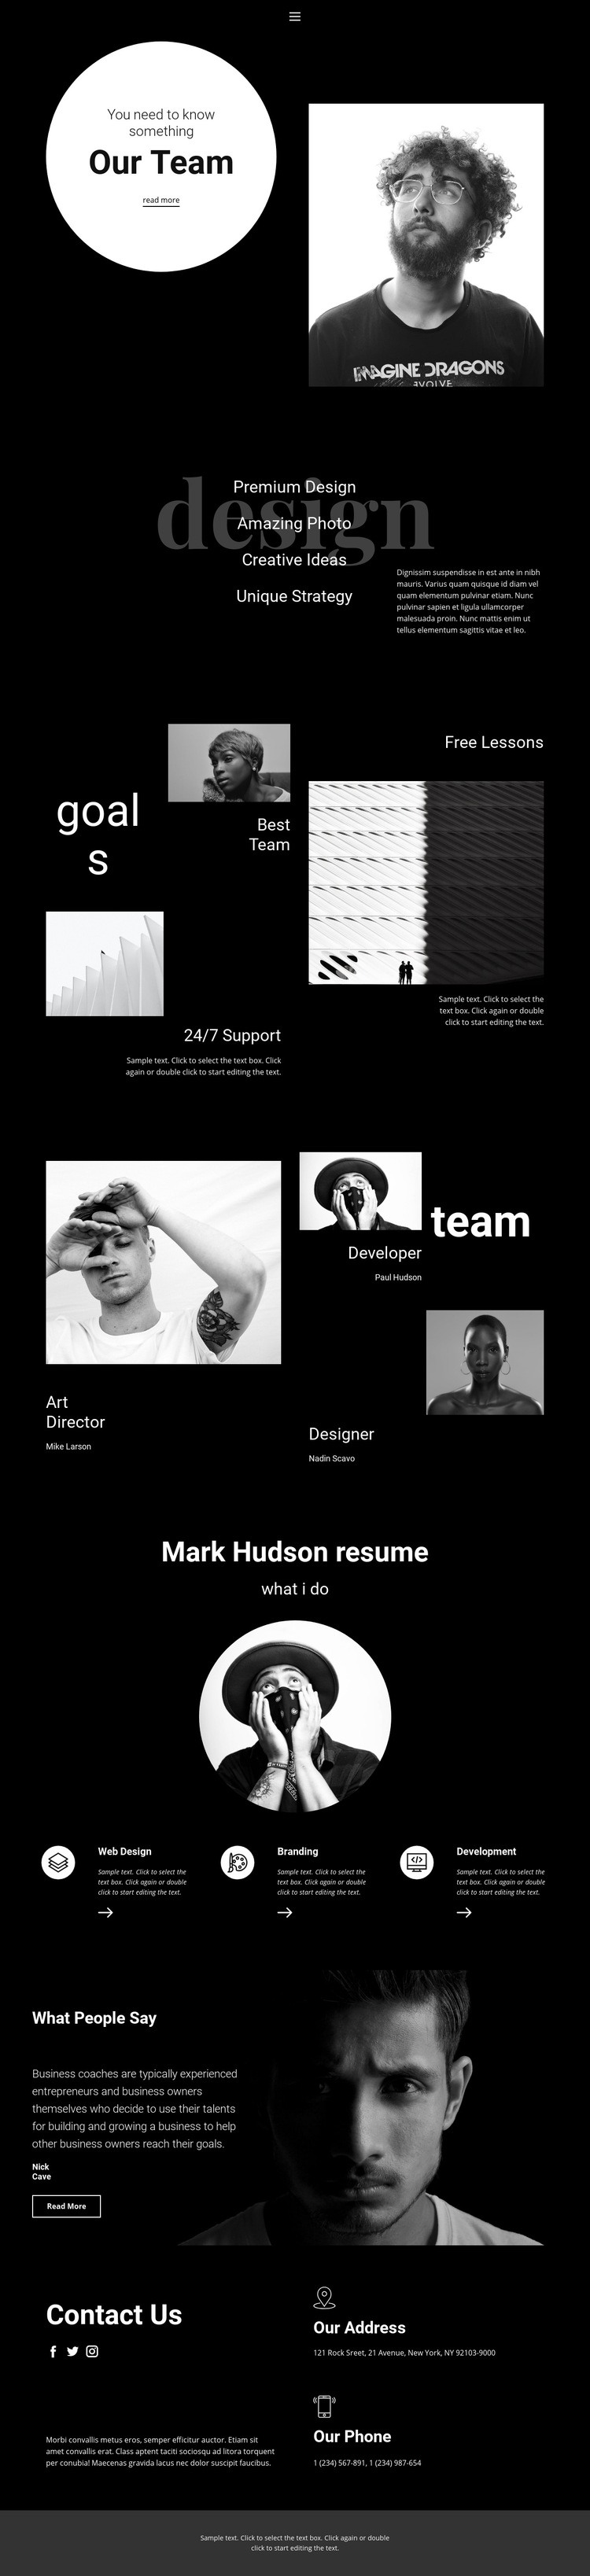 Design and development team Web Page Design